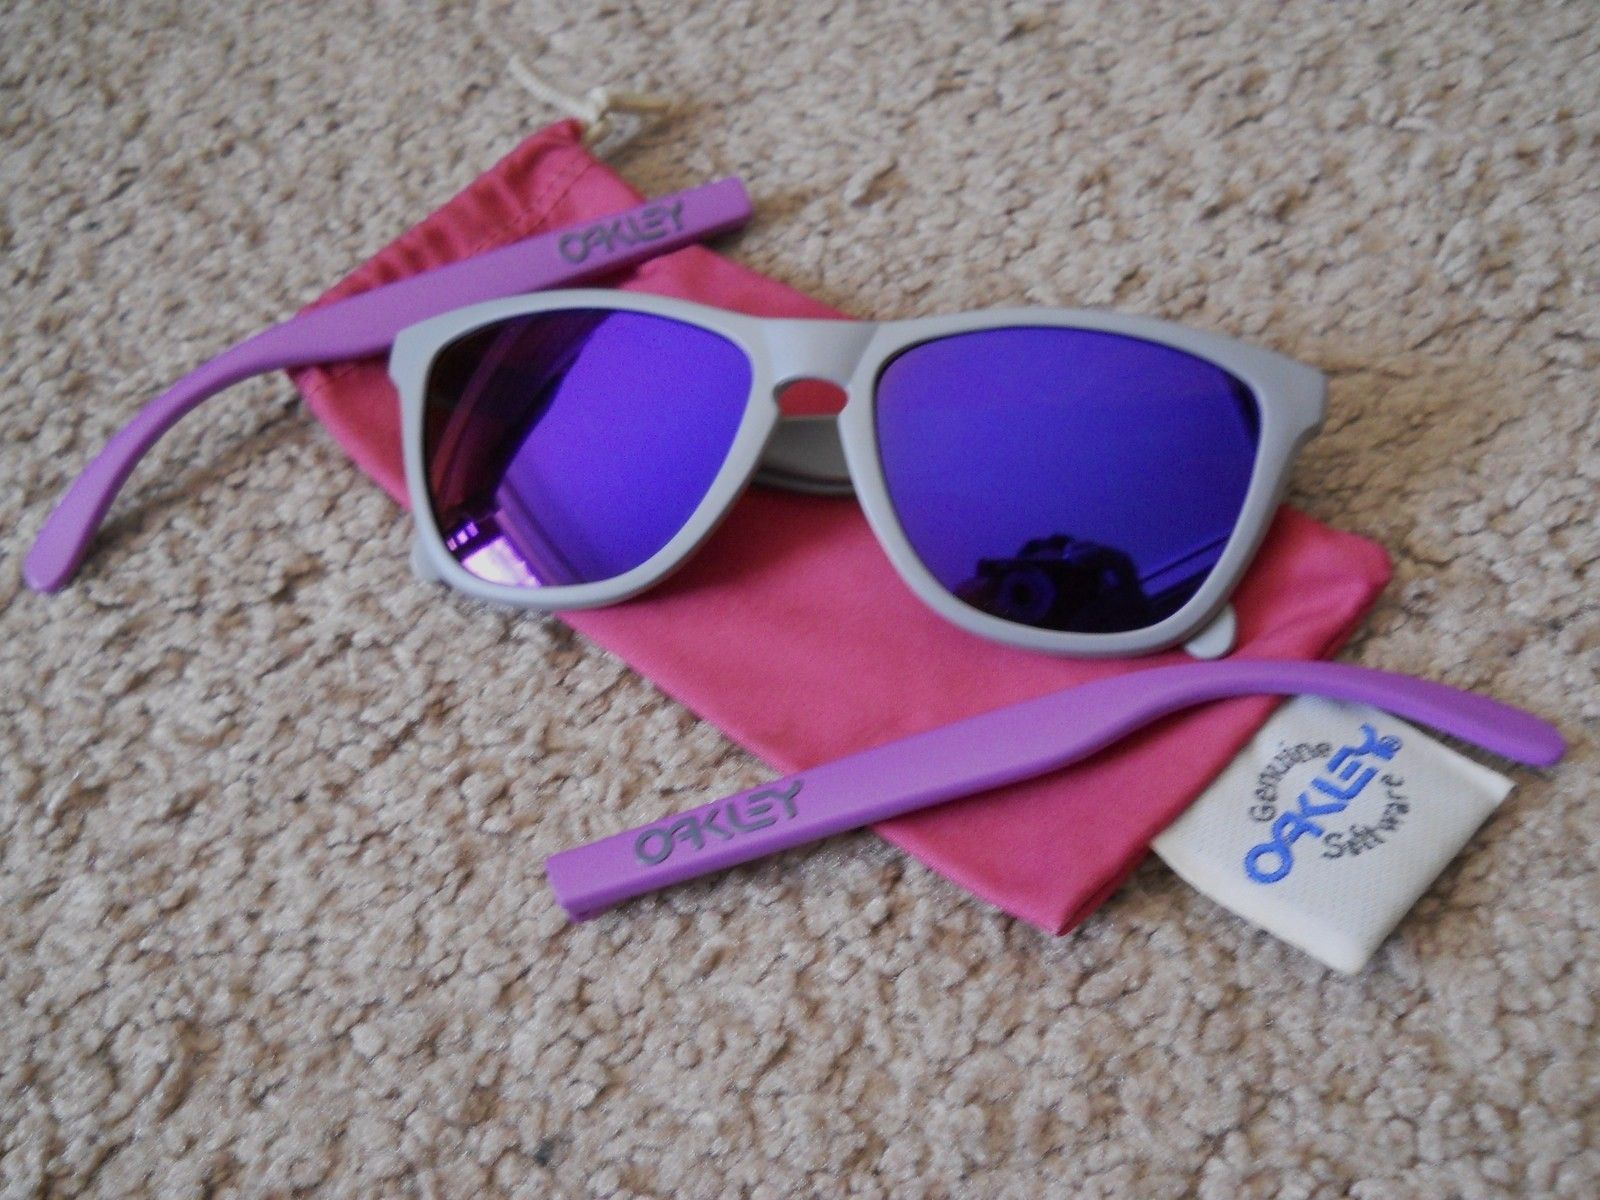 4 Legged Matte Grey/purple - $80.00 - 019phj.jpg